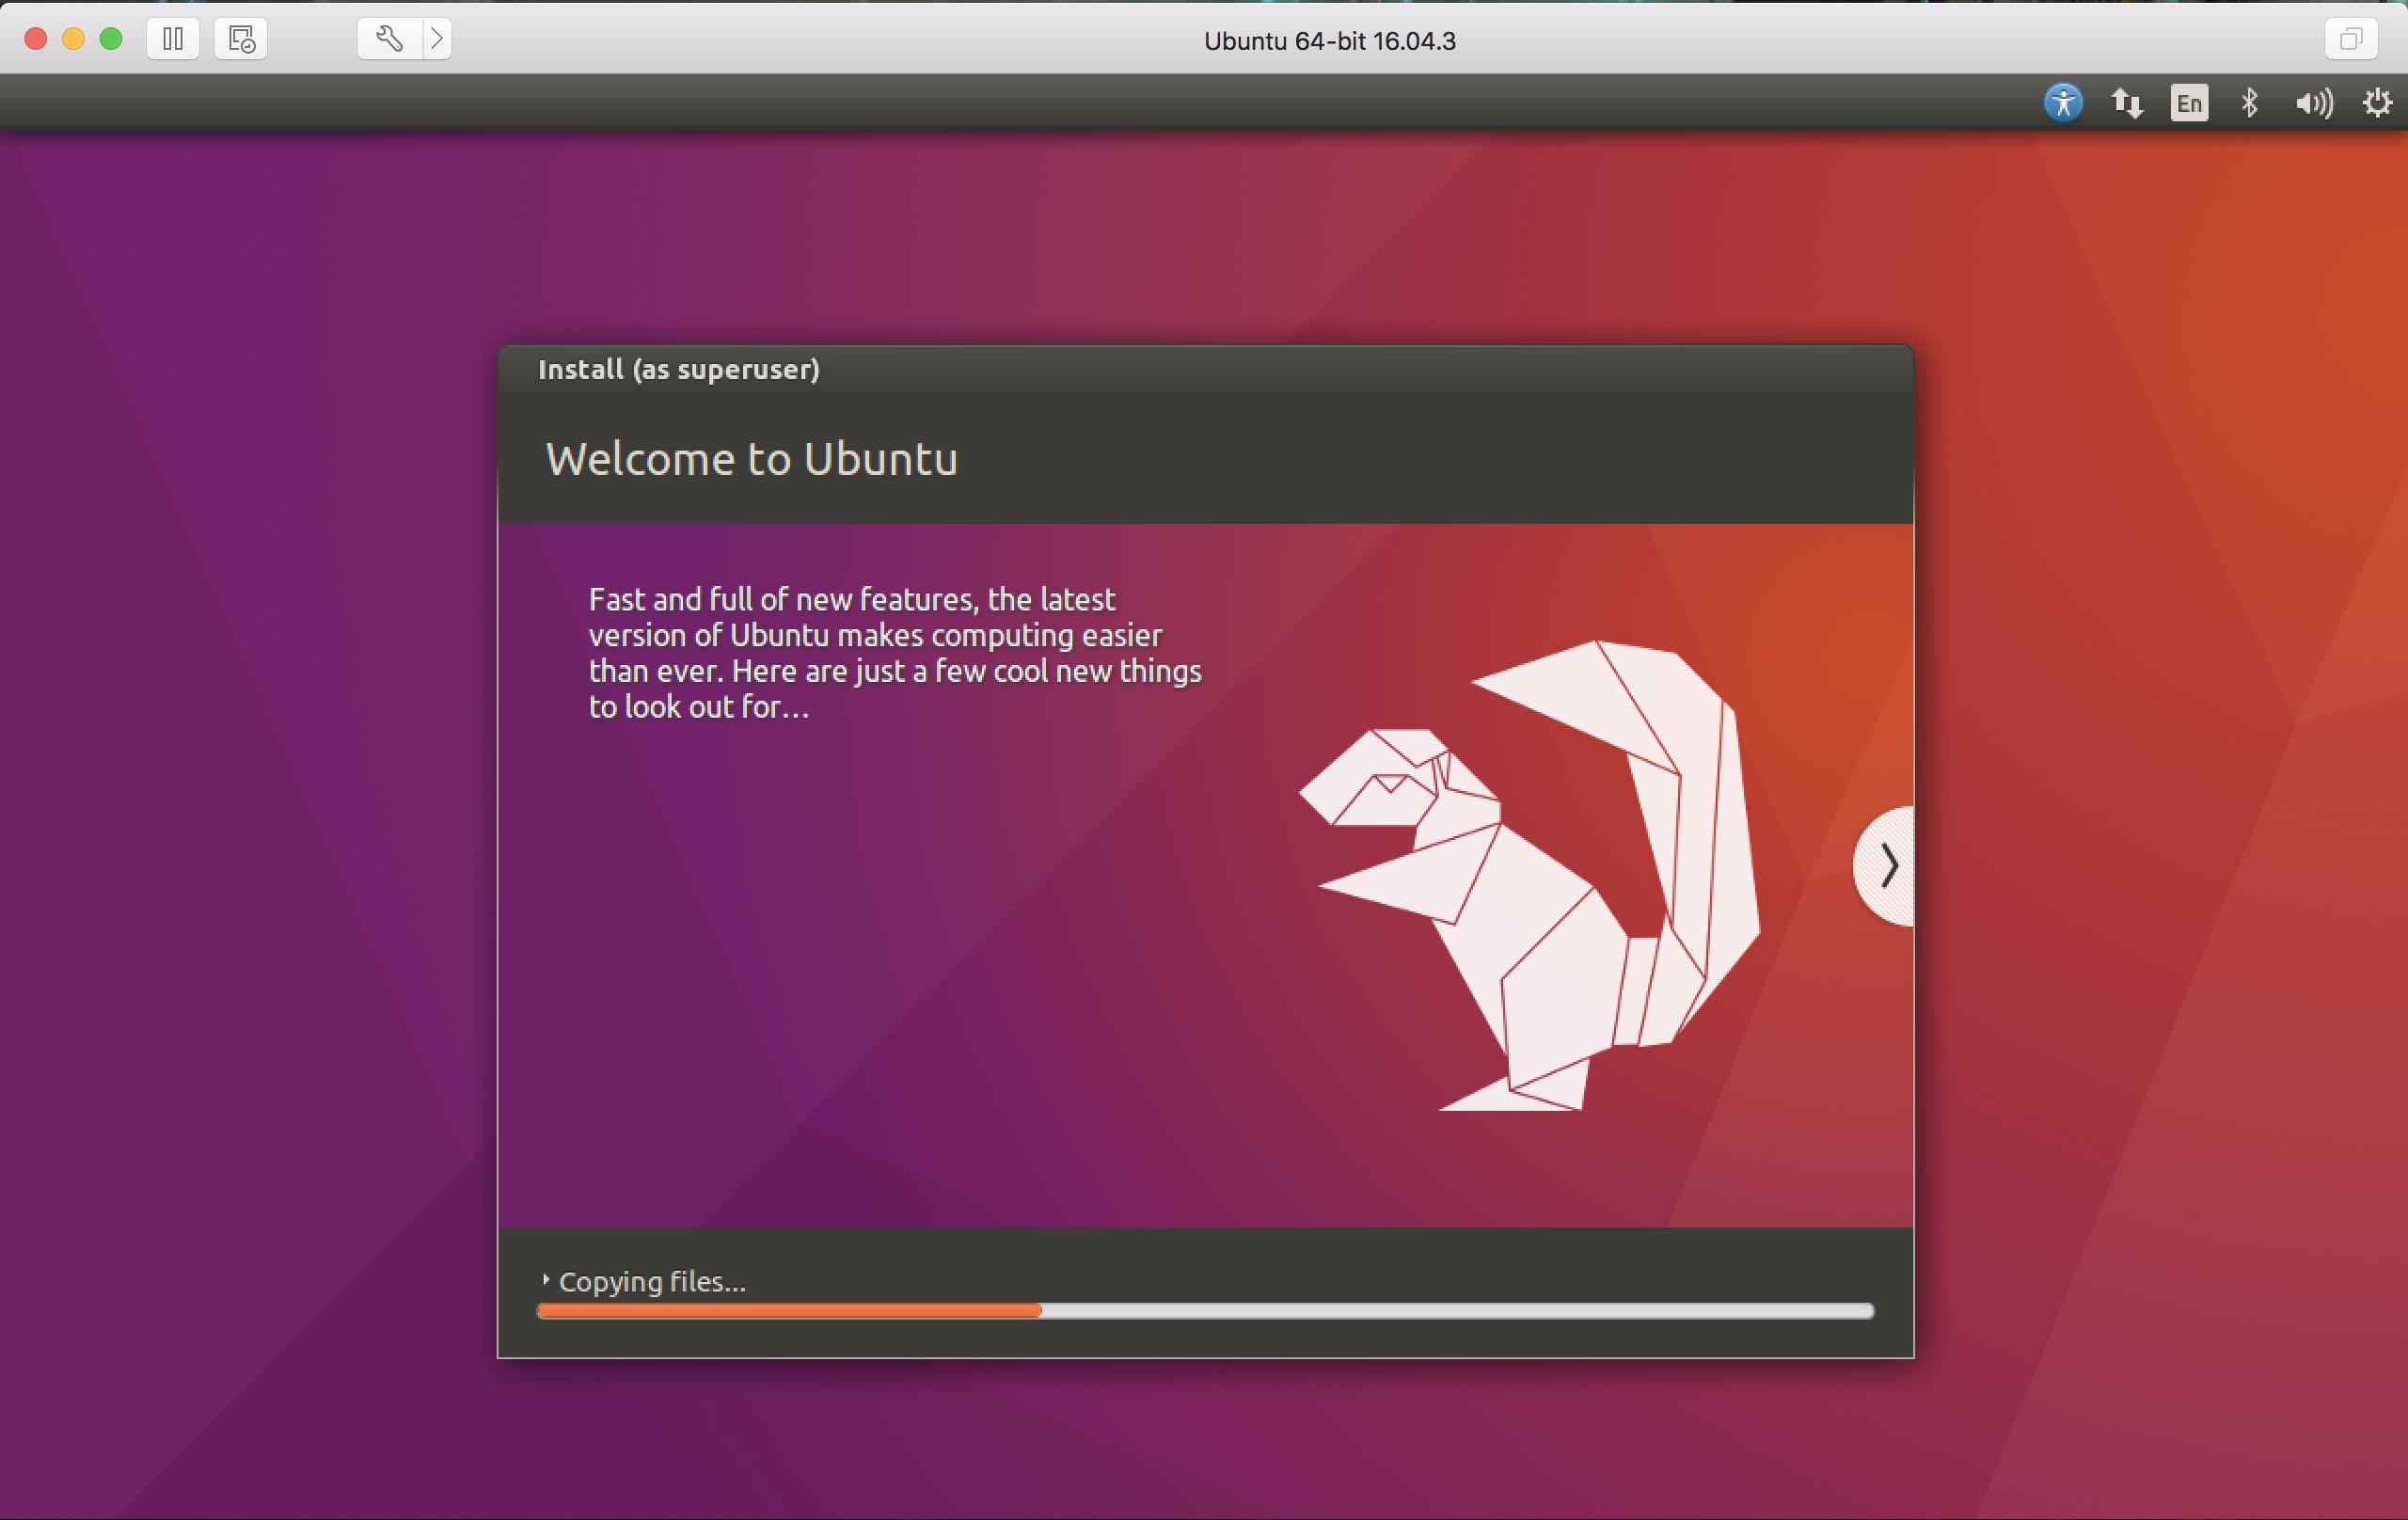 install ubuntu on imac 2017